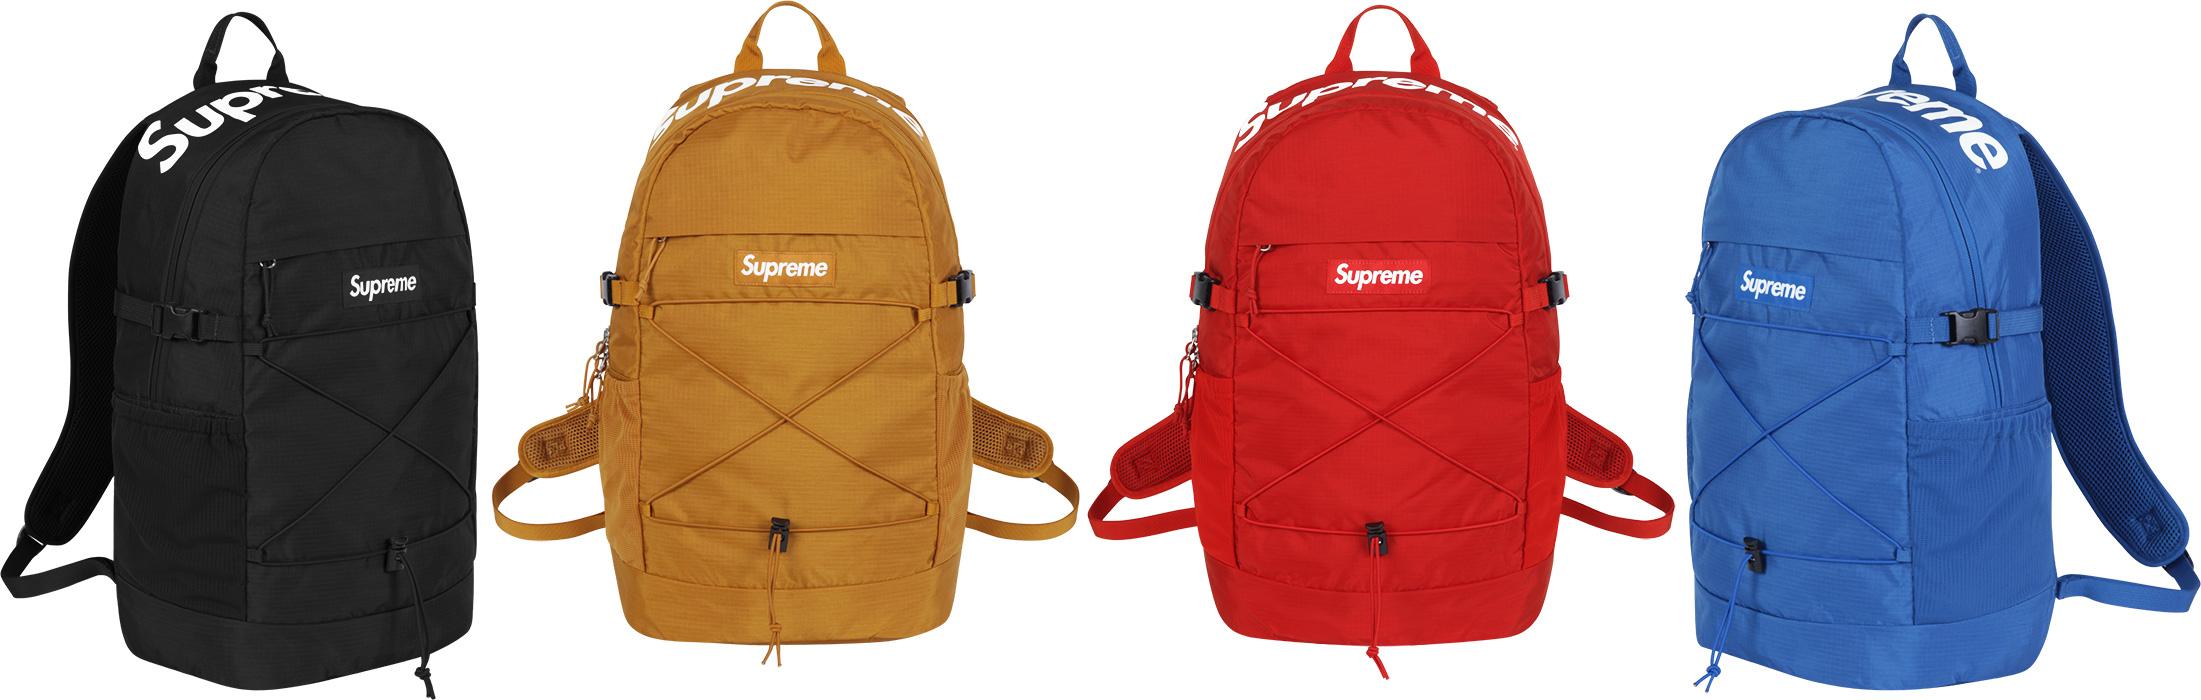 dffa7cfc56 Supreme Supreme Ss 16' Backpack | Grailed